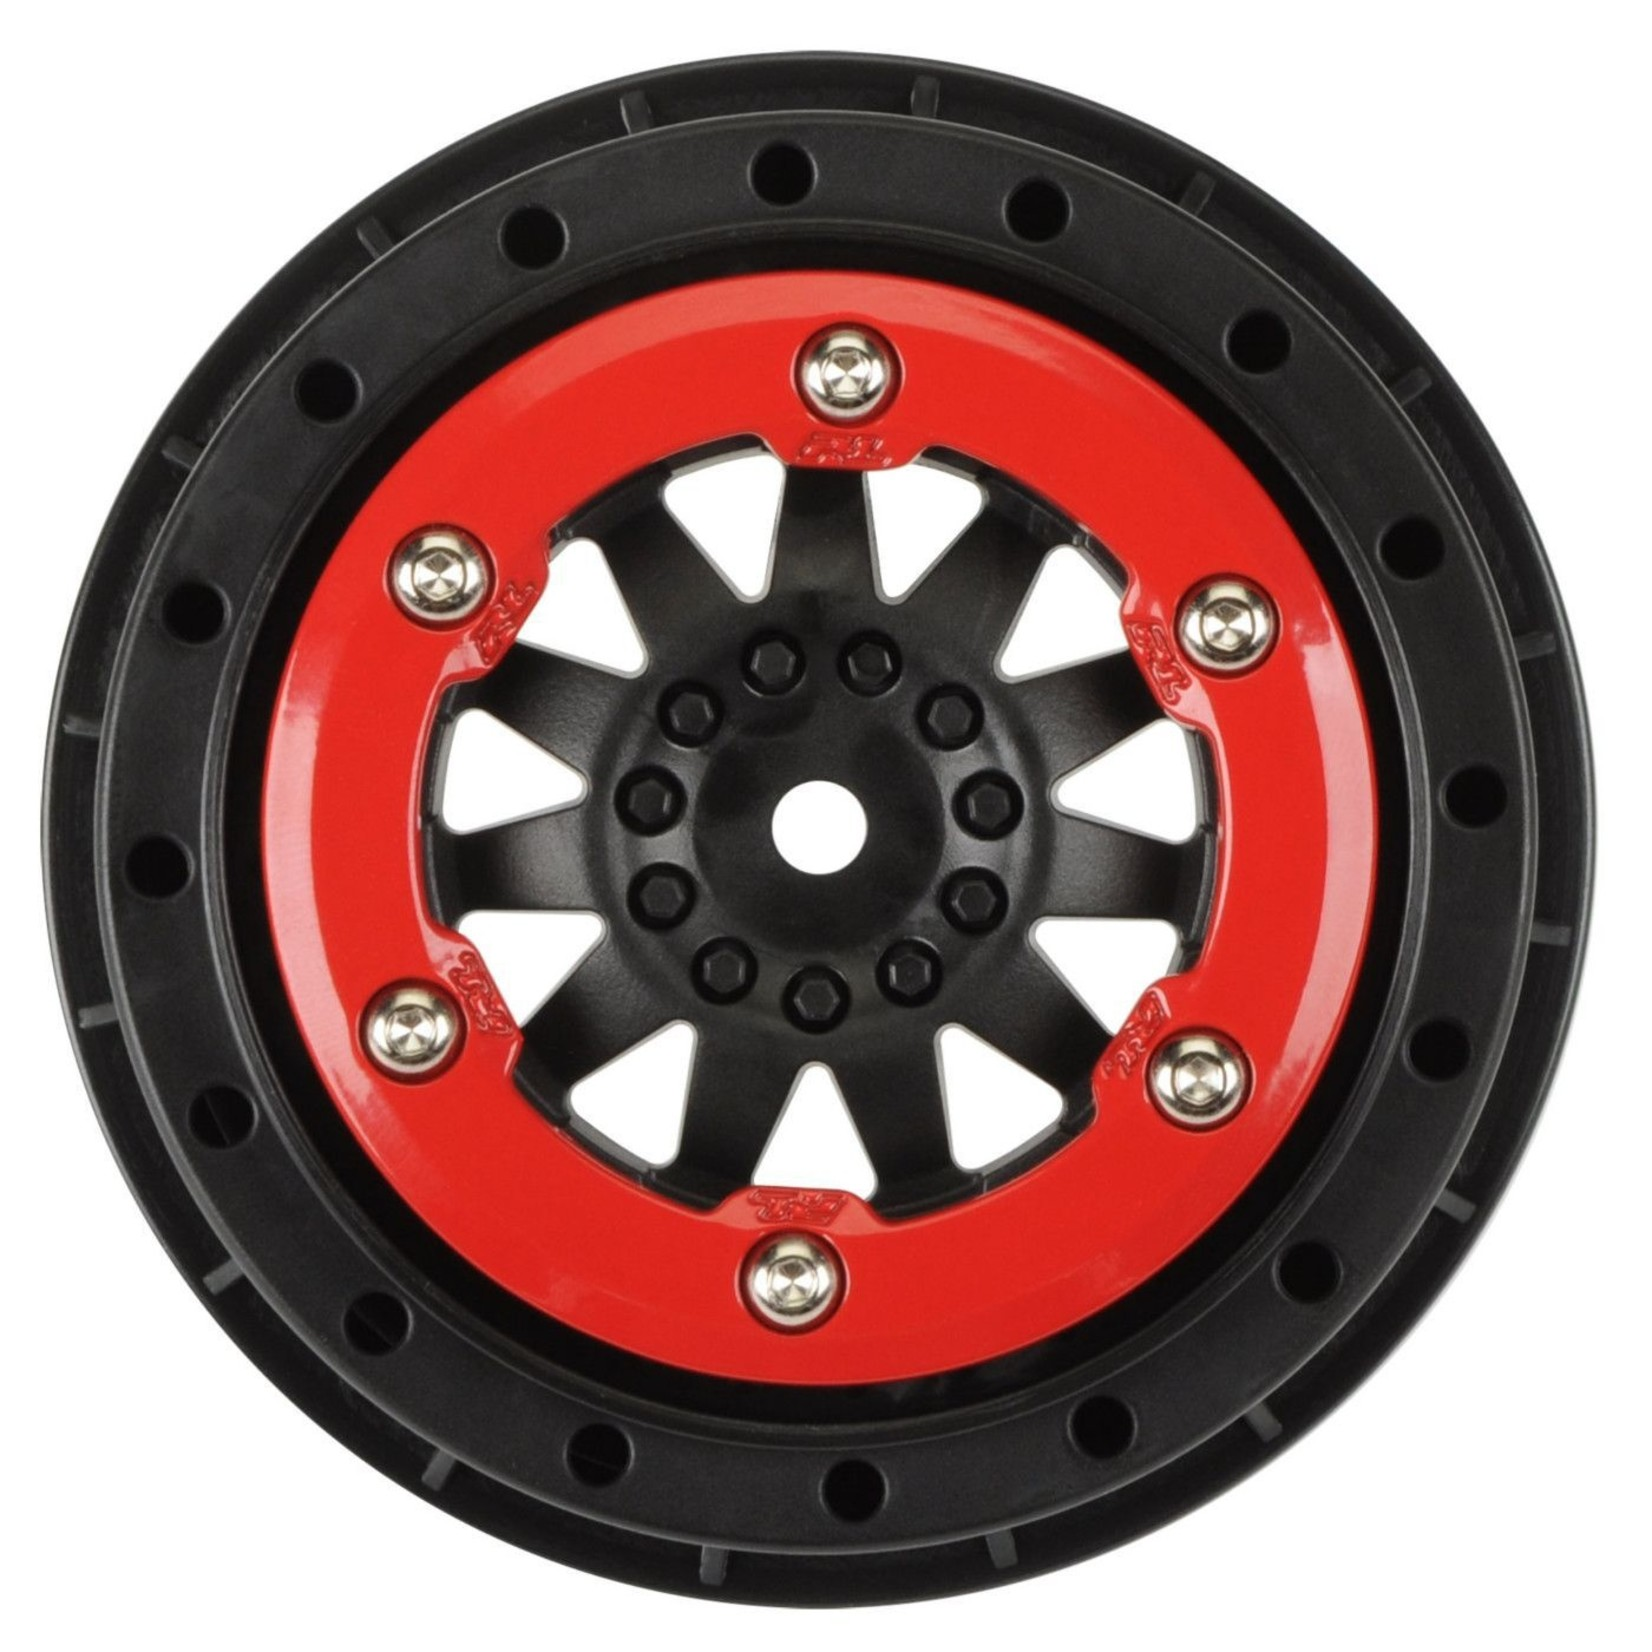 Pro-Line Racing PRO2745-03 Pro-Line ProTrac Suspension Kit F-11 2.2/3.0 Red/Black  Bead Los Wheels